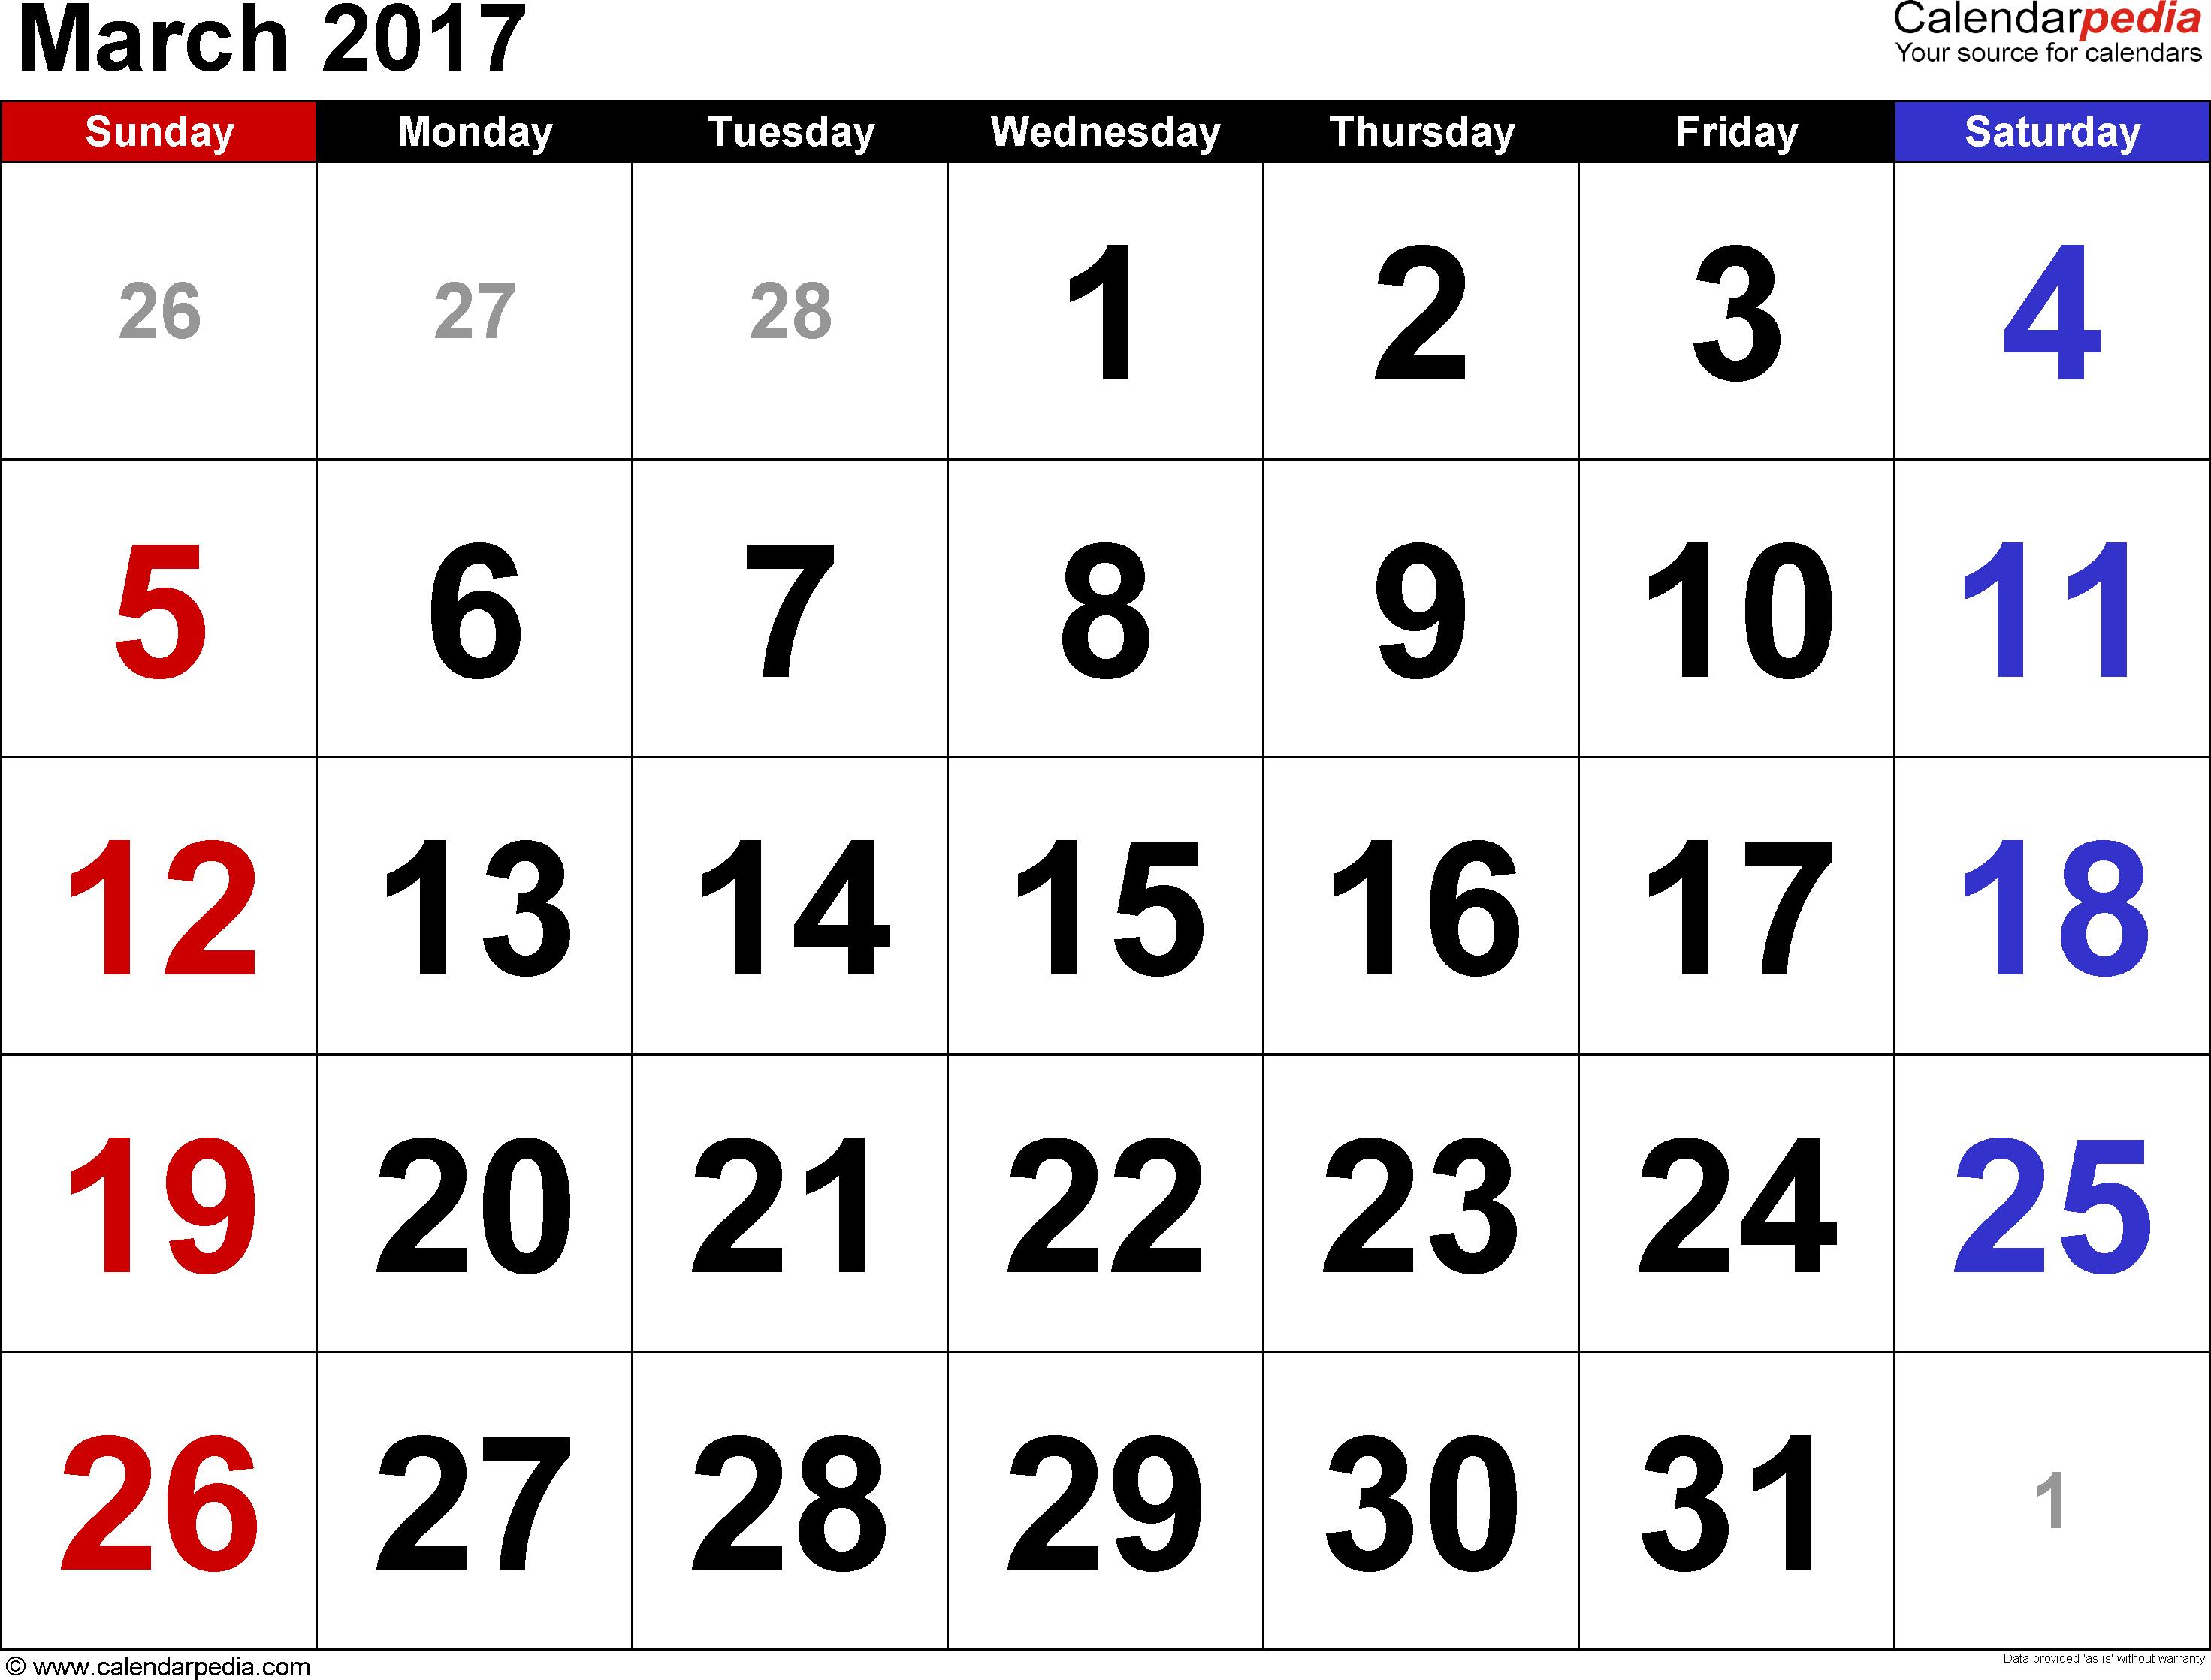 Editable March 2017 Calendar Template MS Word